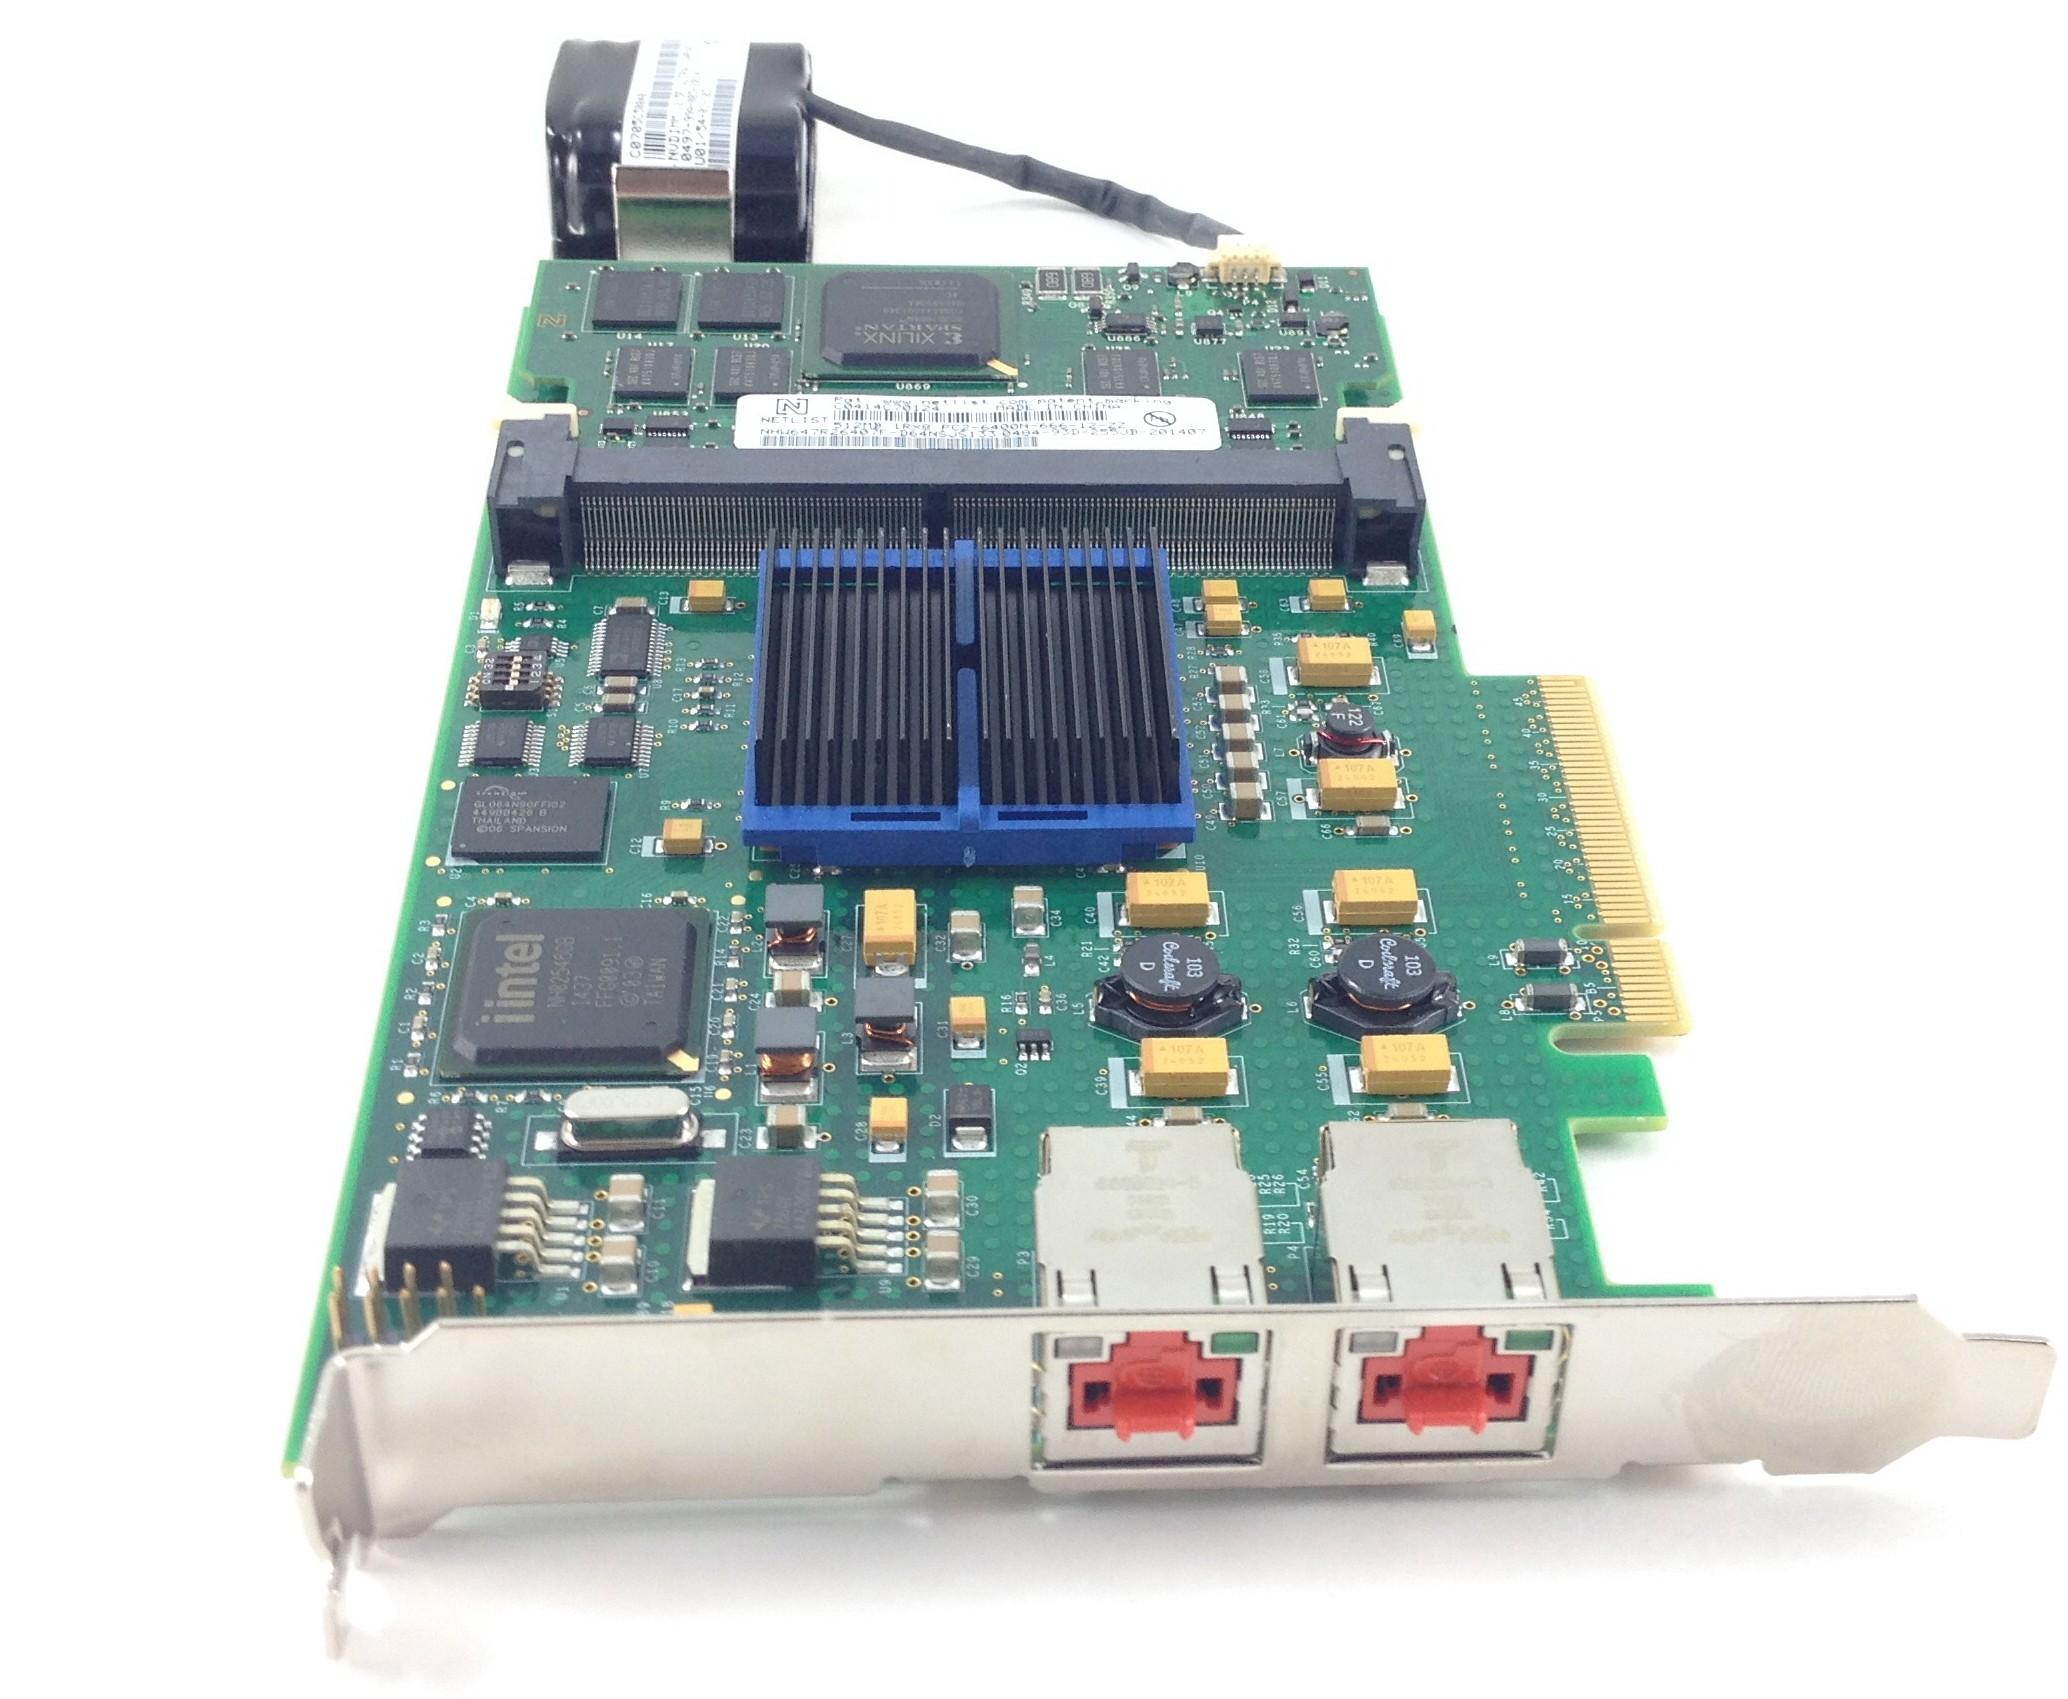 Dell Compellent Sc8000 512MB Cache PCI-E Battery Backed Raid Controller  (0DV94N)